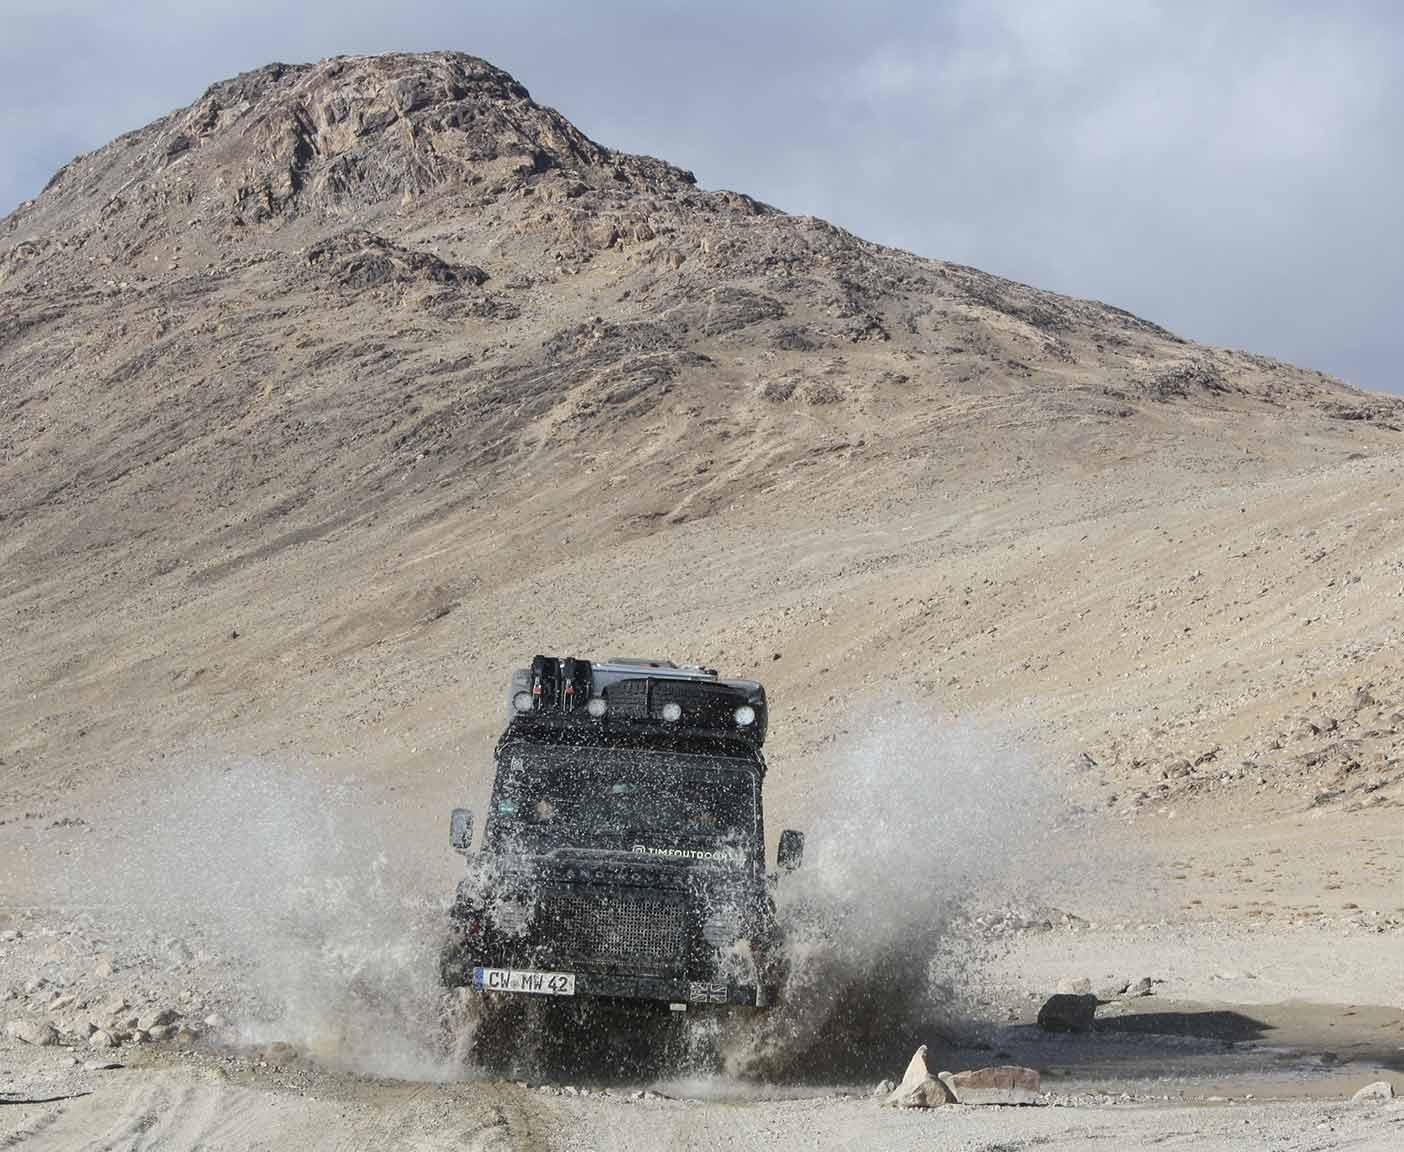 Land-Rover-Defender-110-td5-dachzelt-hard-top-zentralasien-technische-daten